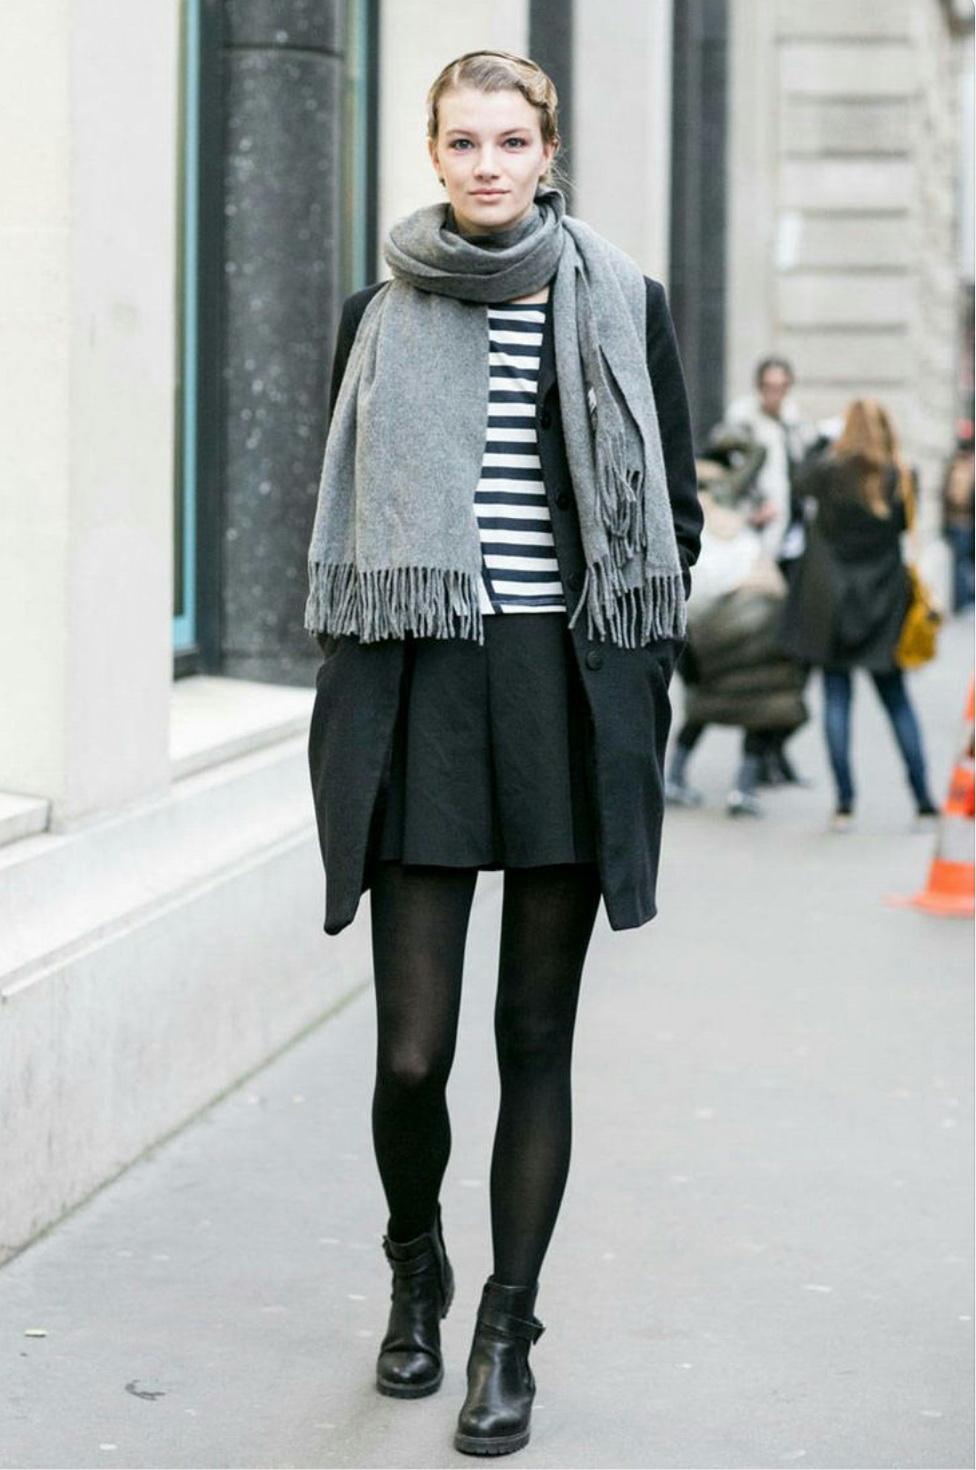 french style parisian chic street style - dress like a french woman (35) JPUJTNO